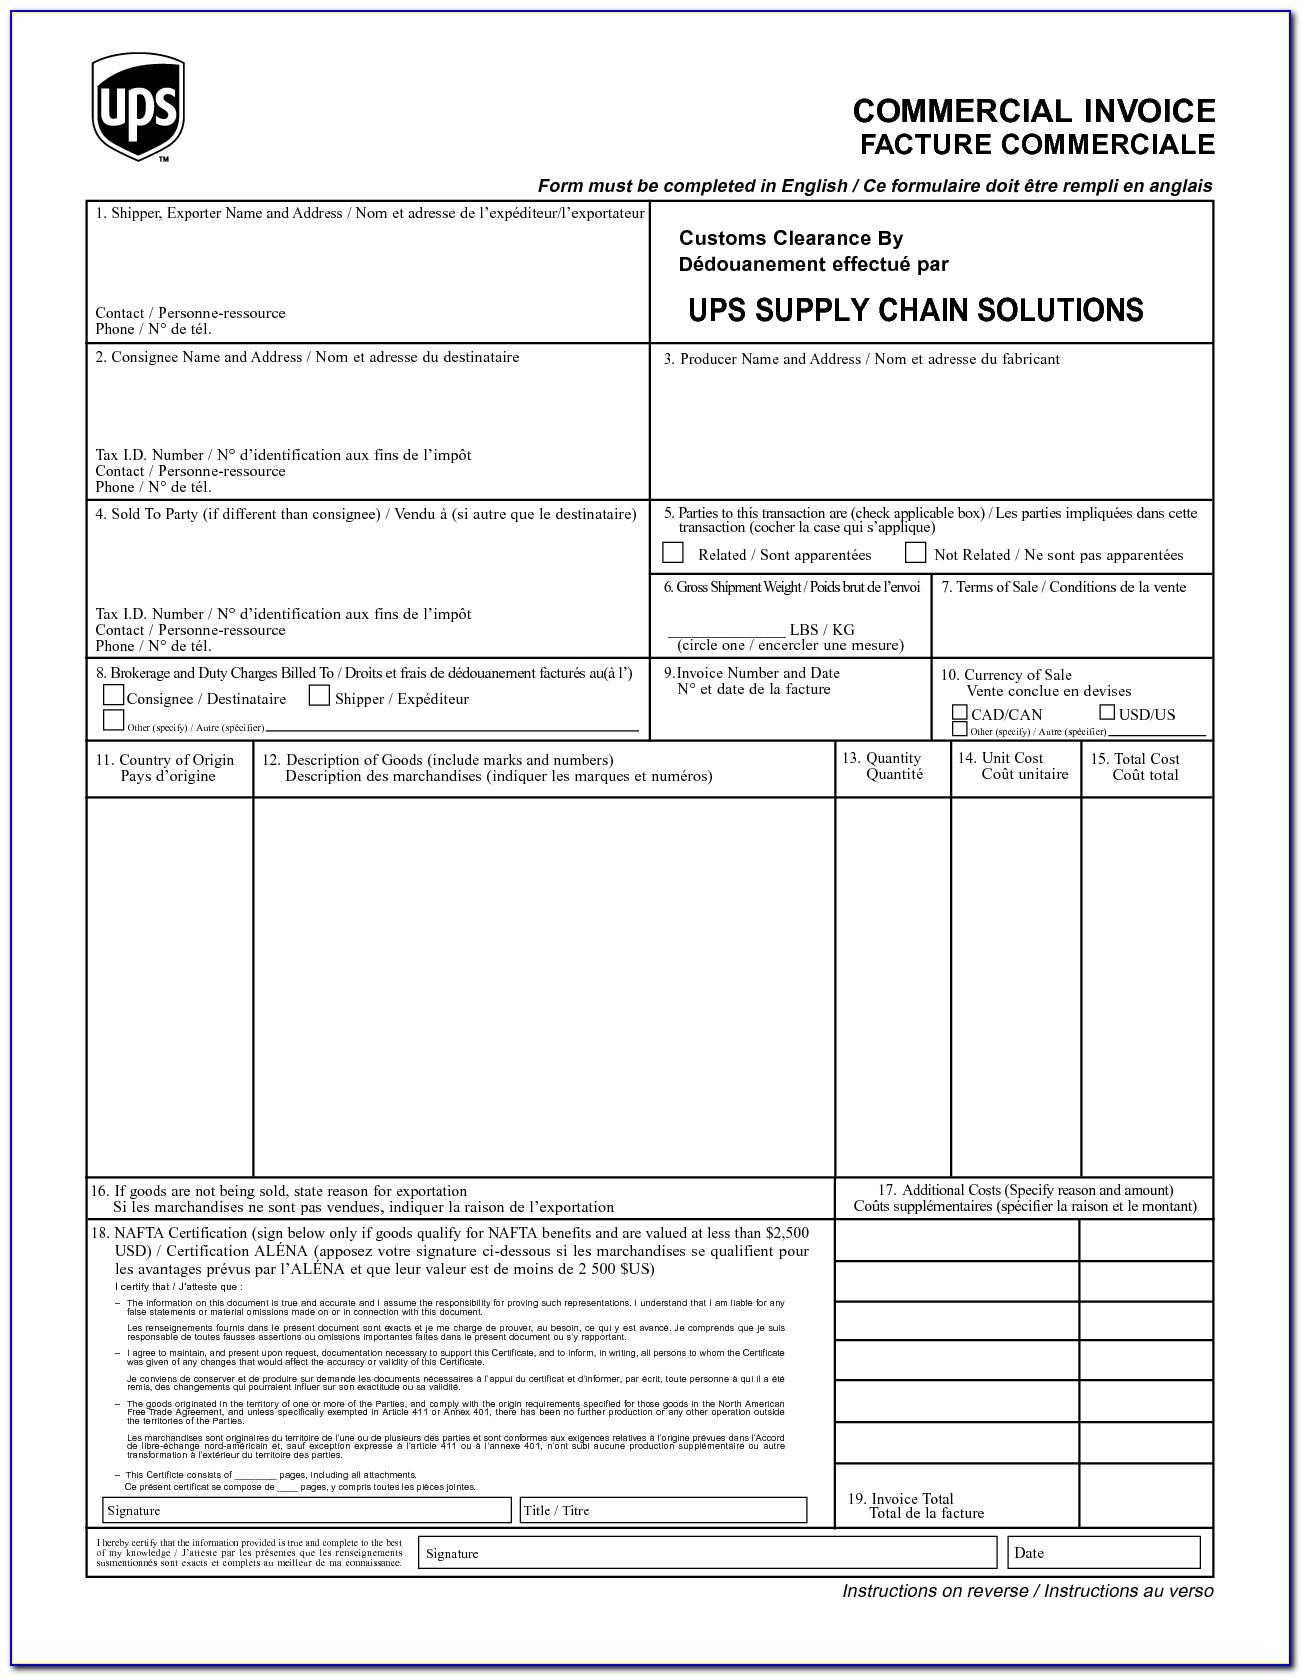 Fedex Commercial Invoice Fillable Online